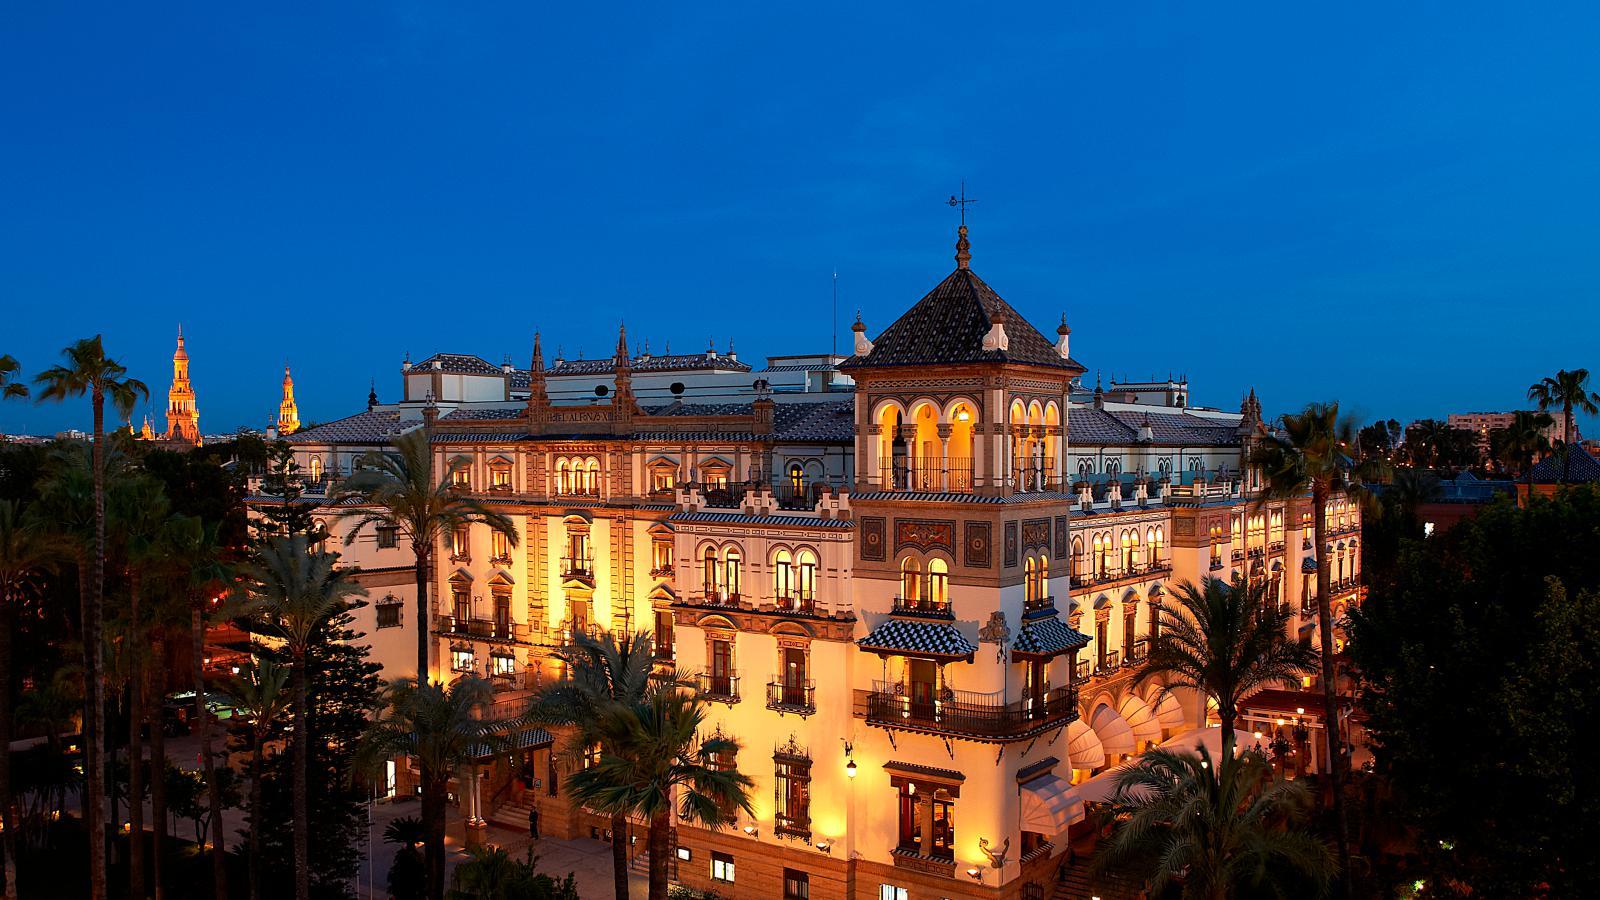 Loveisspeed hotel alfonso xiii seville spain - Hotel alfonso xii sevilla ...